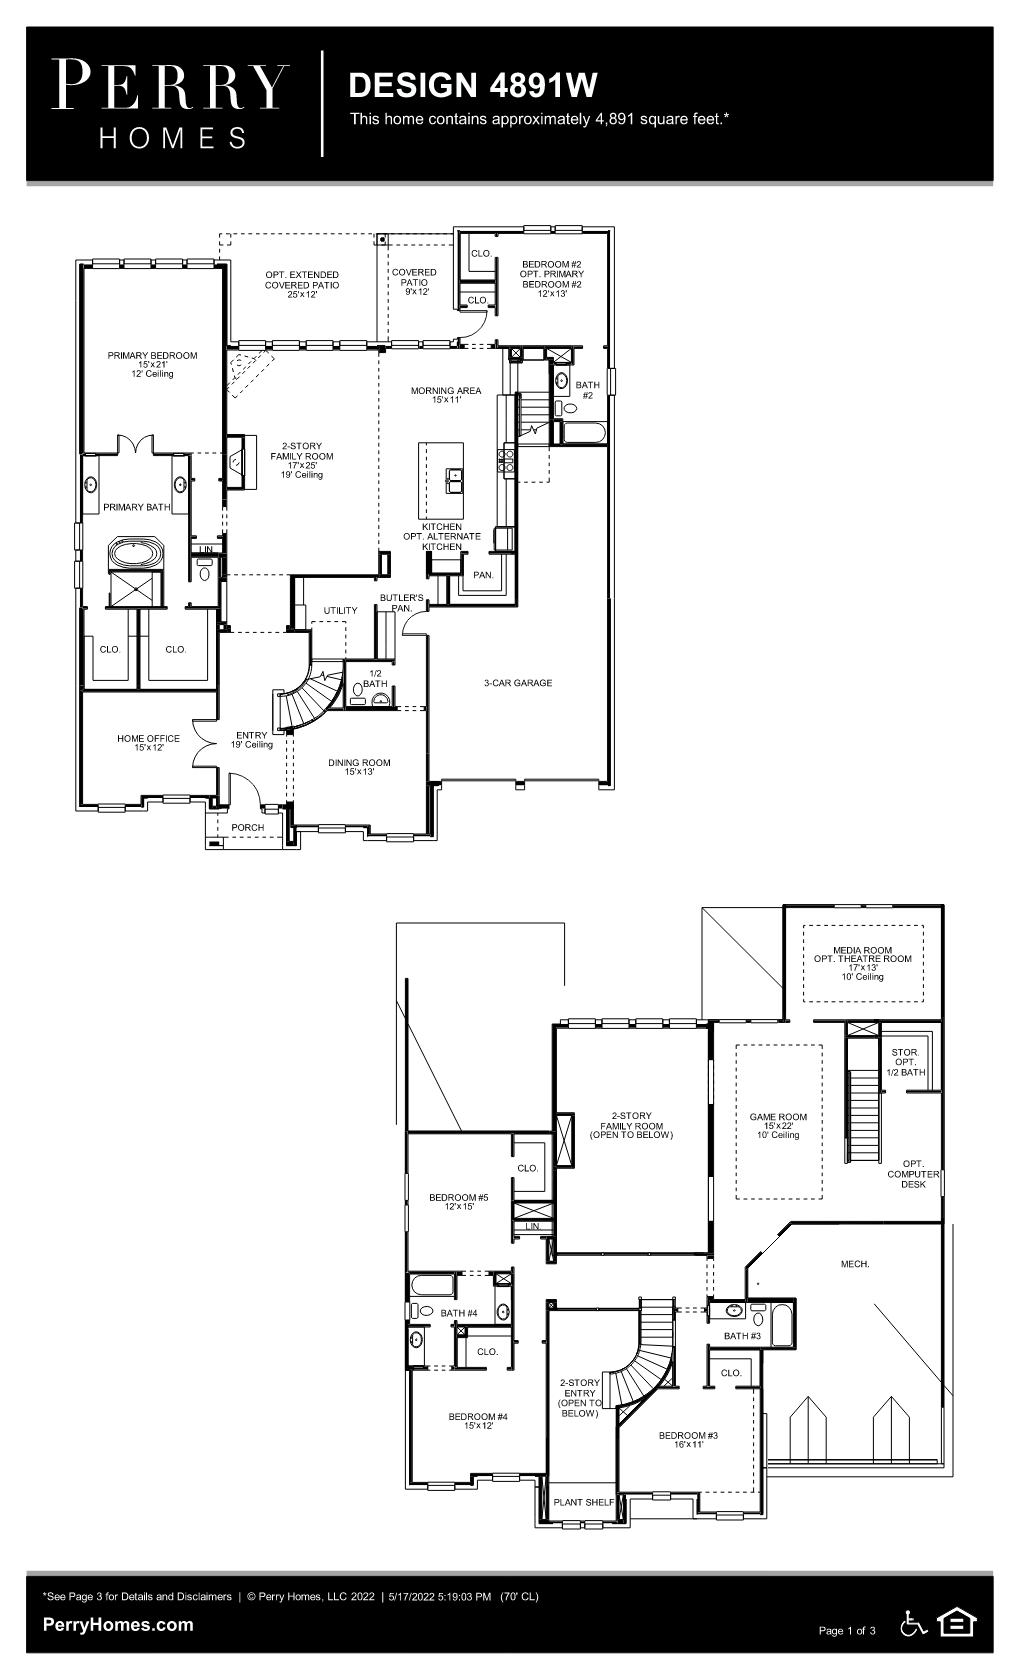 Floor Plan for 4891W